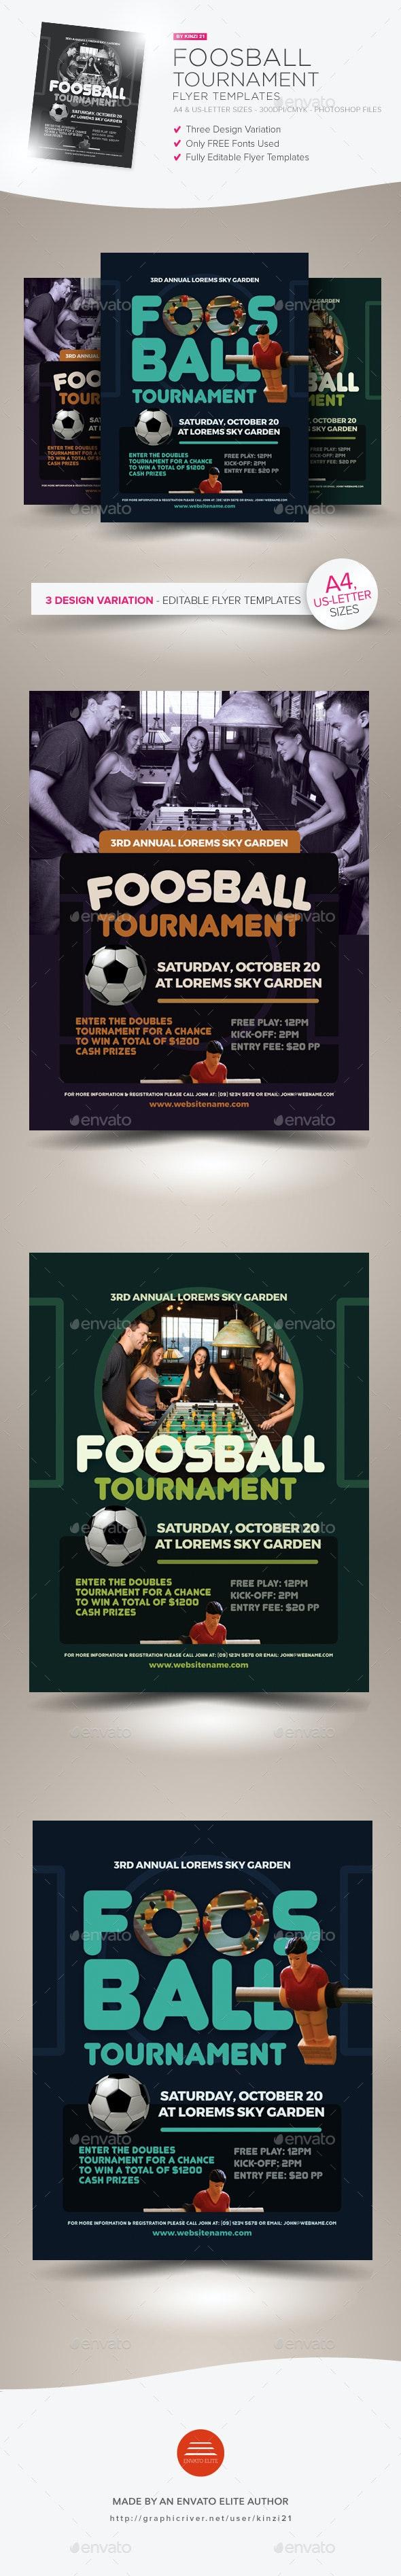 Foosball Tournament Flyer Templates - Sports Events